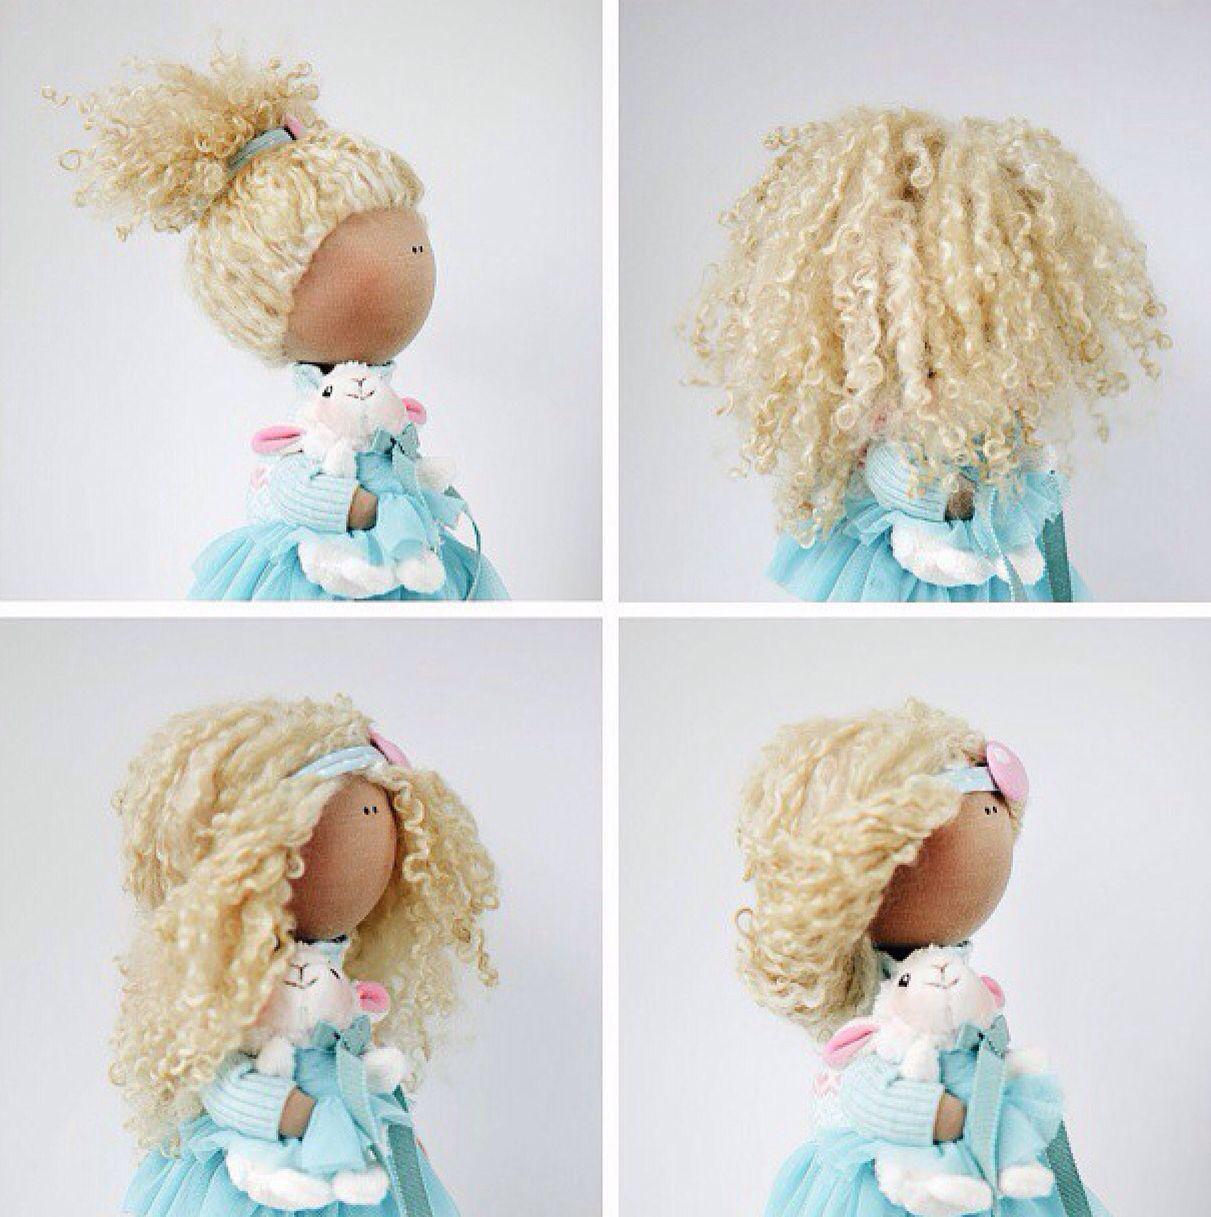 Doll toys images  Pin by Vera Shlyk on Тыквоголовка  Pinterest  Dolls